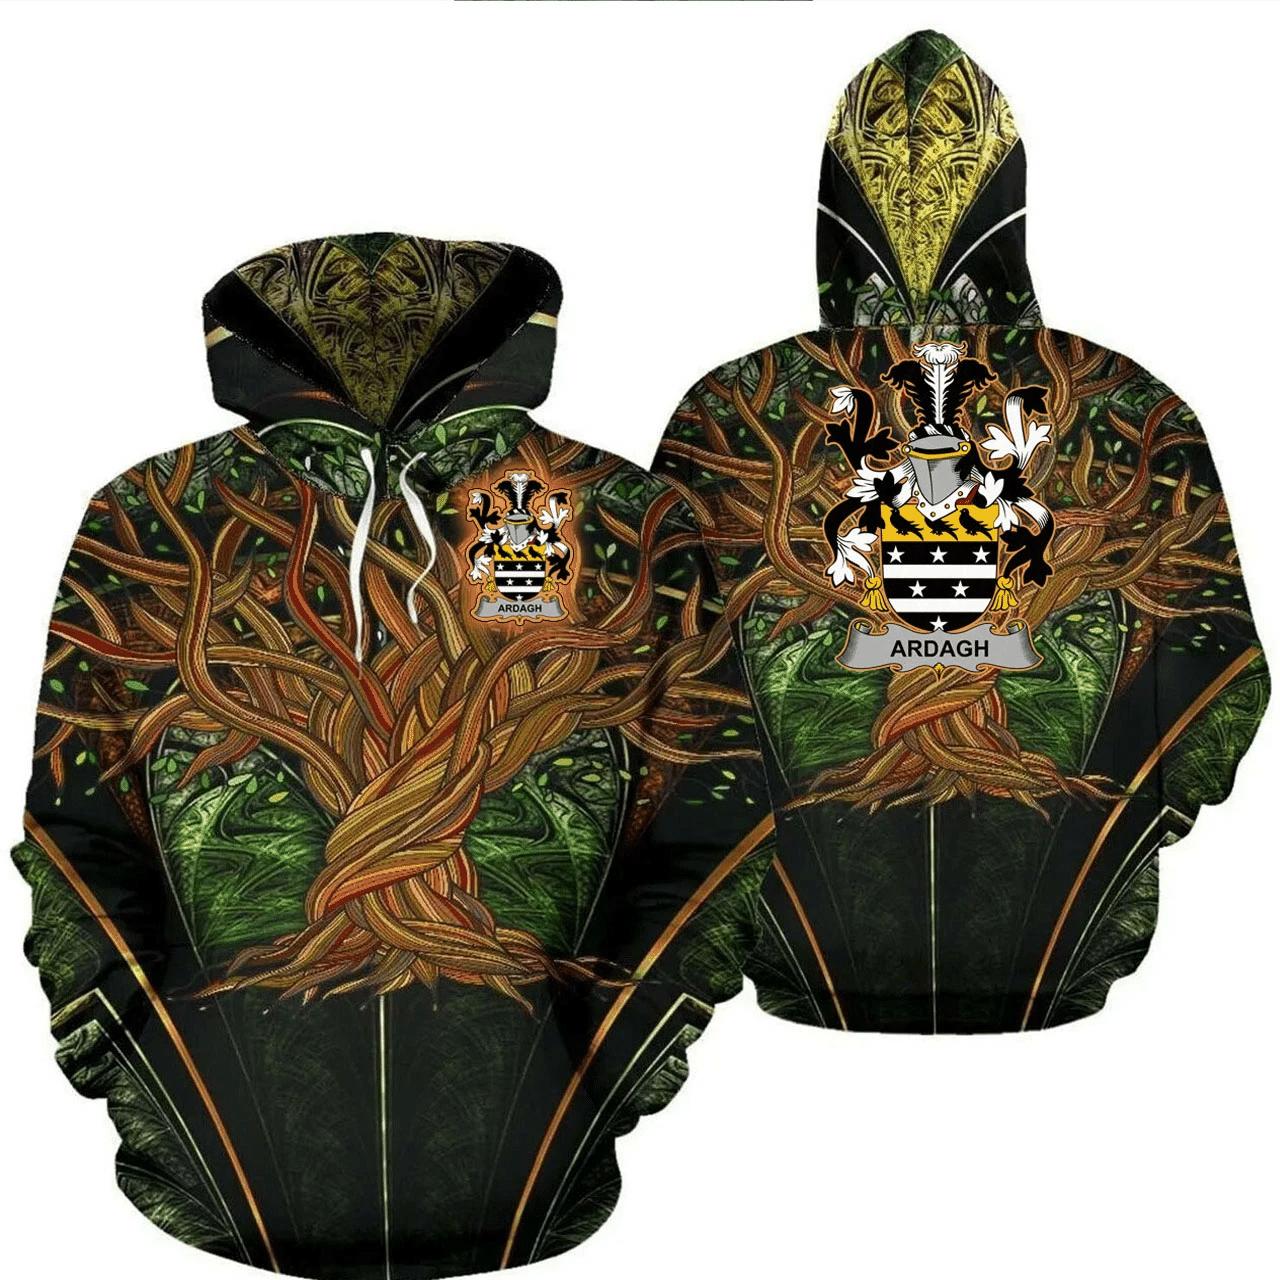 1stIreland Ireland Hoodie - Ardagh Irish Family Crest Hoodie - Tree Of Life A7